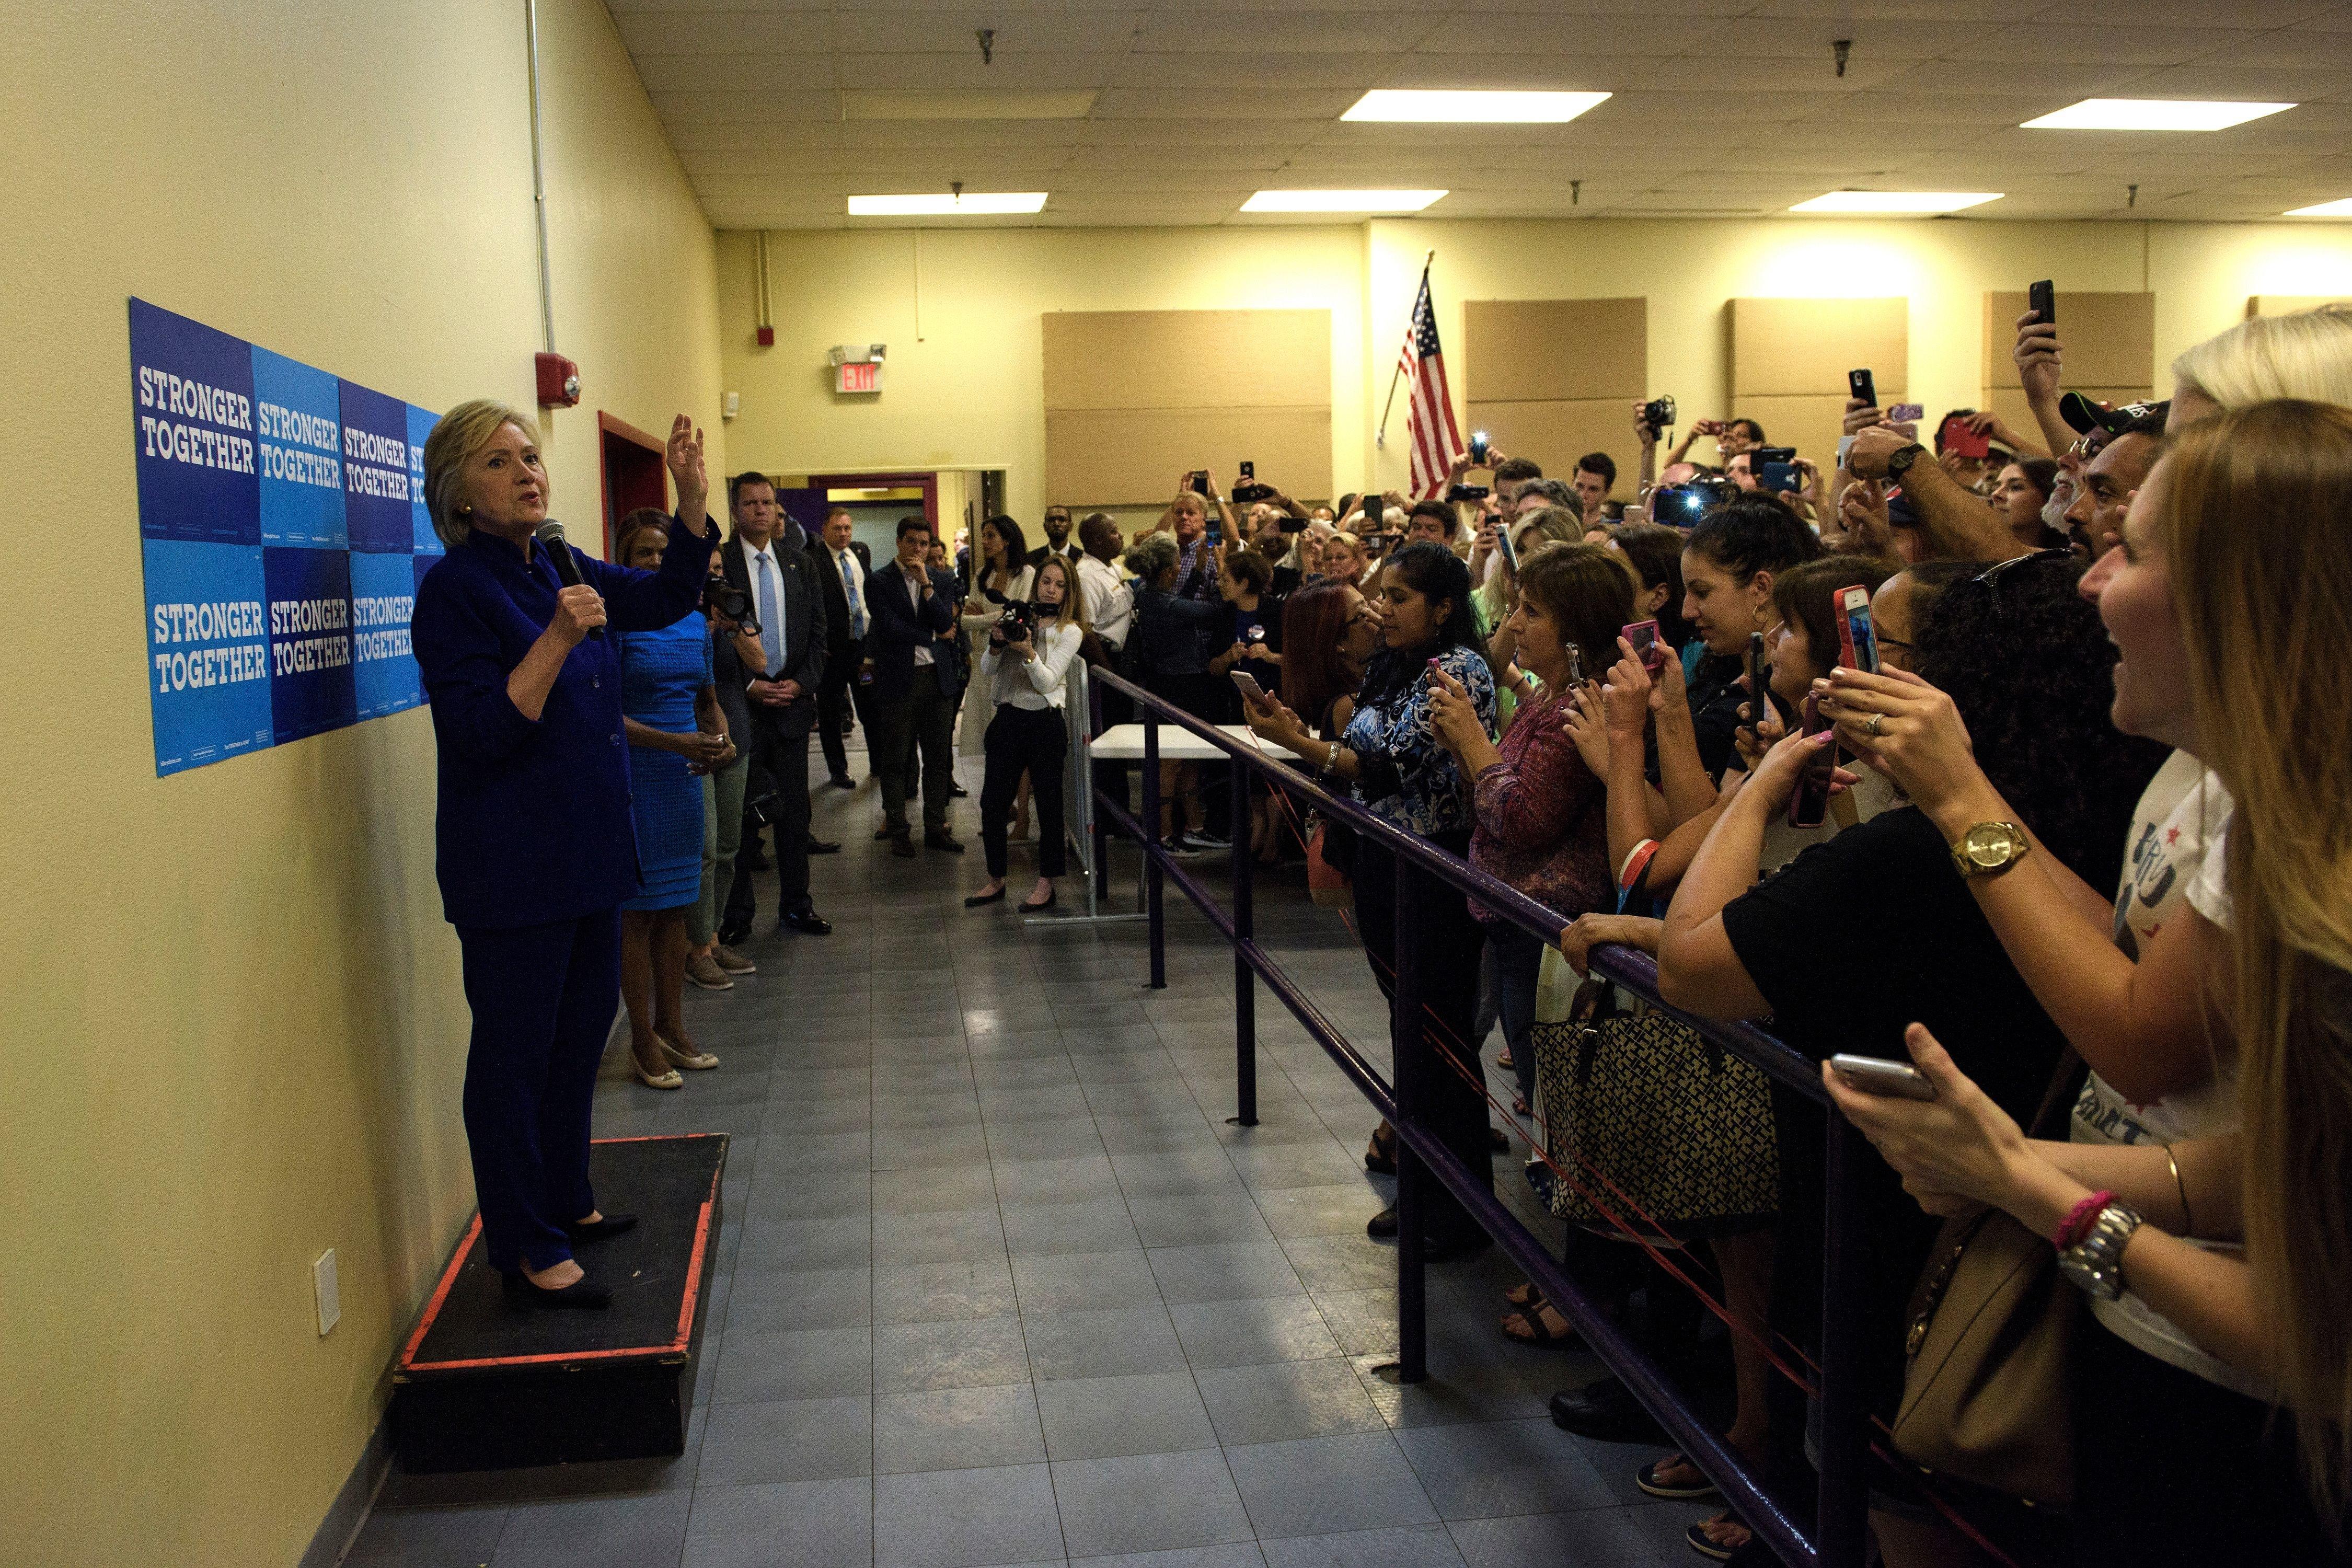 One Bizarre Campaign Photo Captures 2016